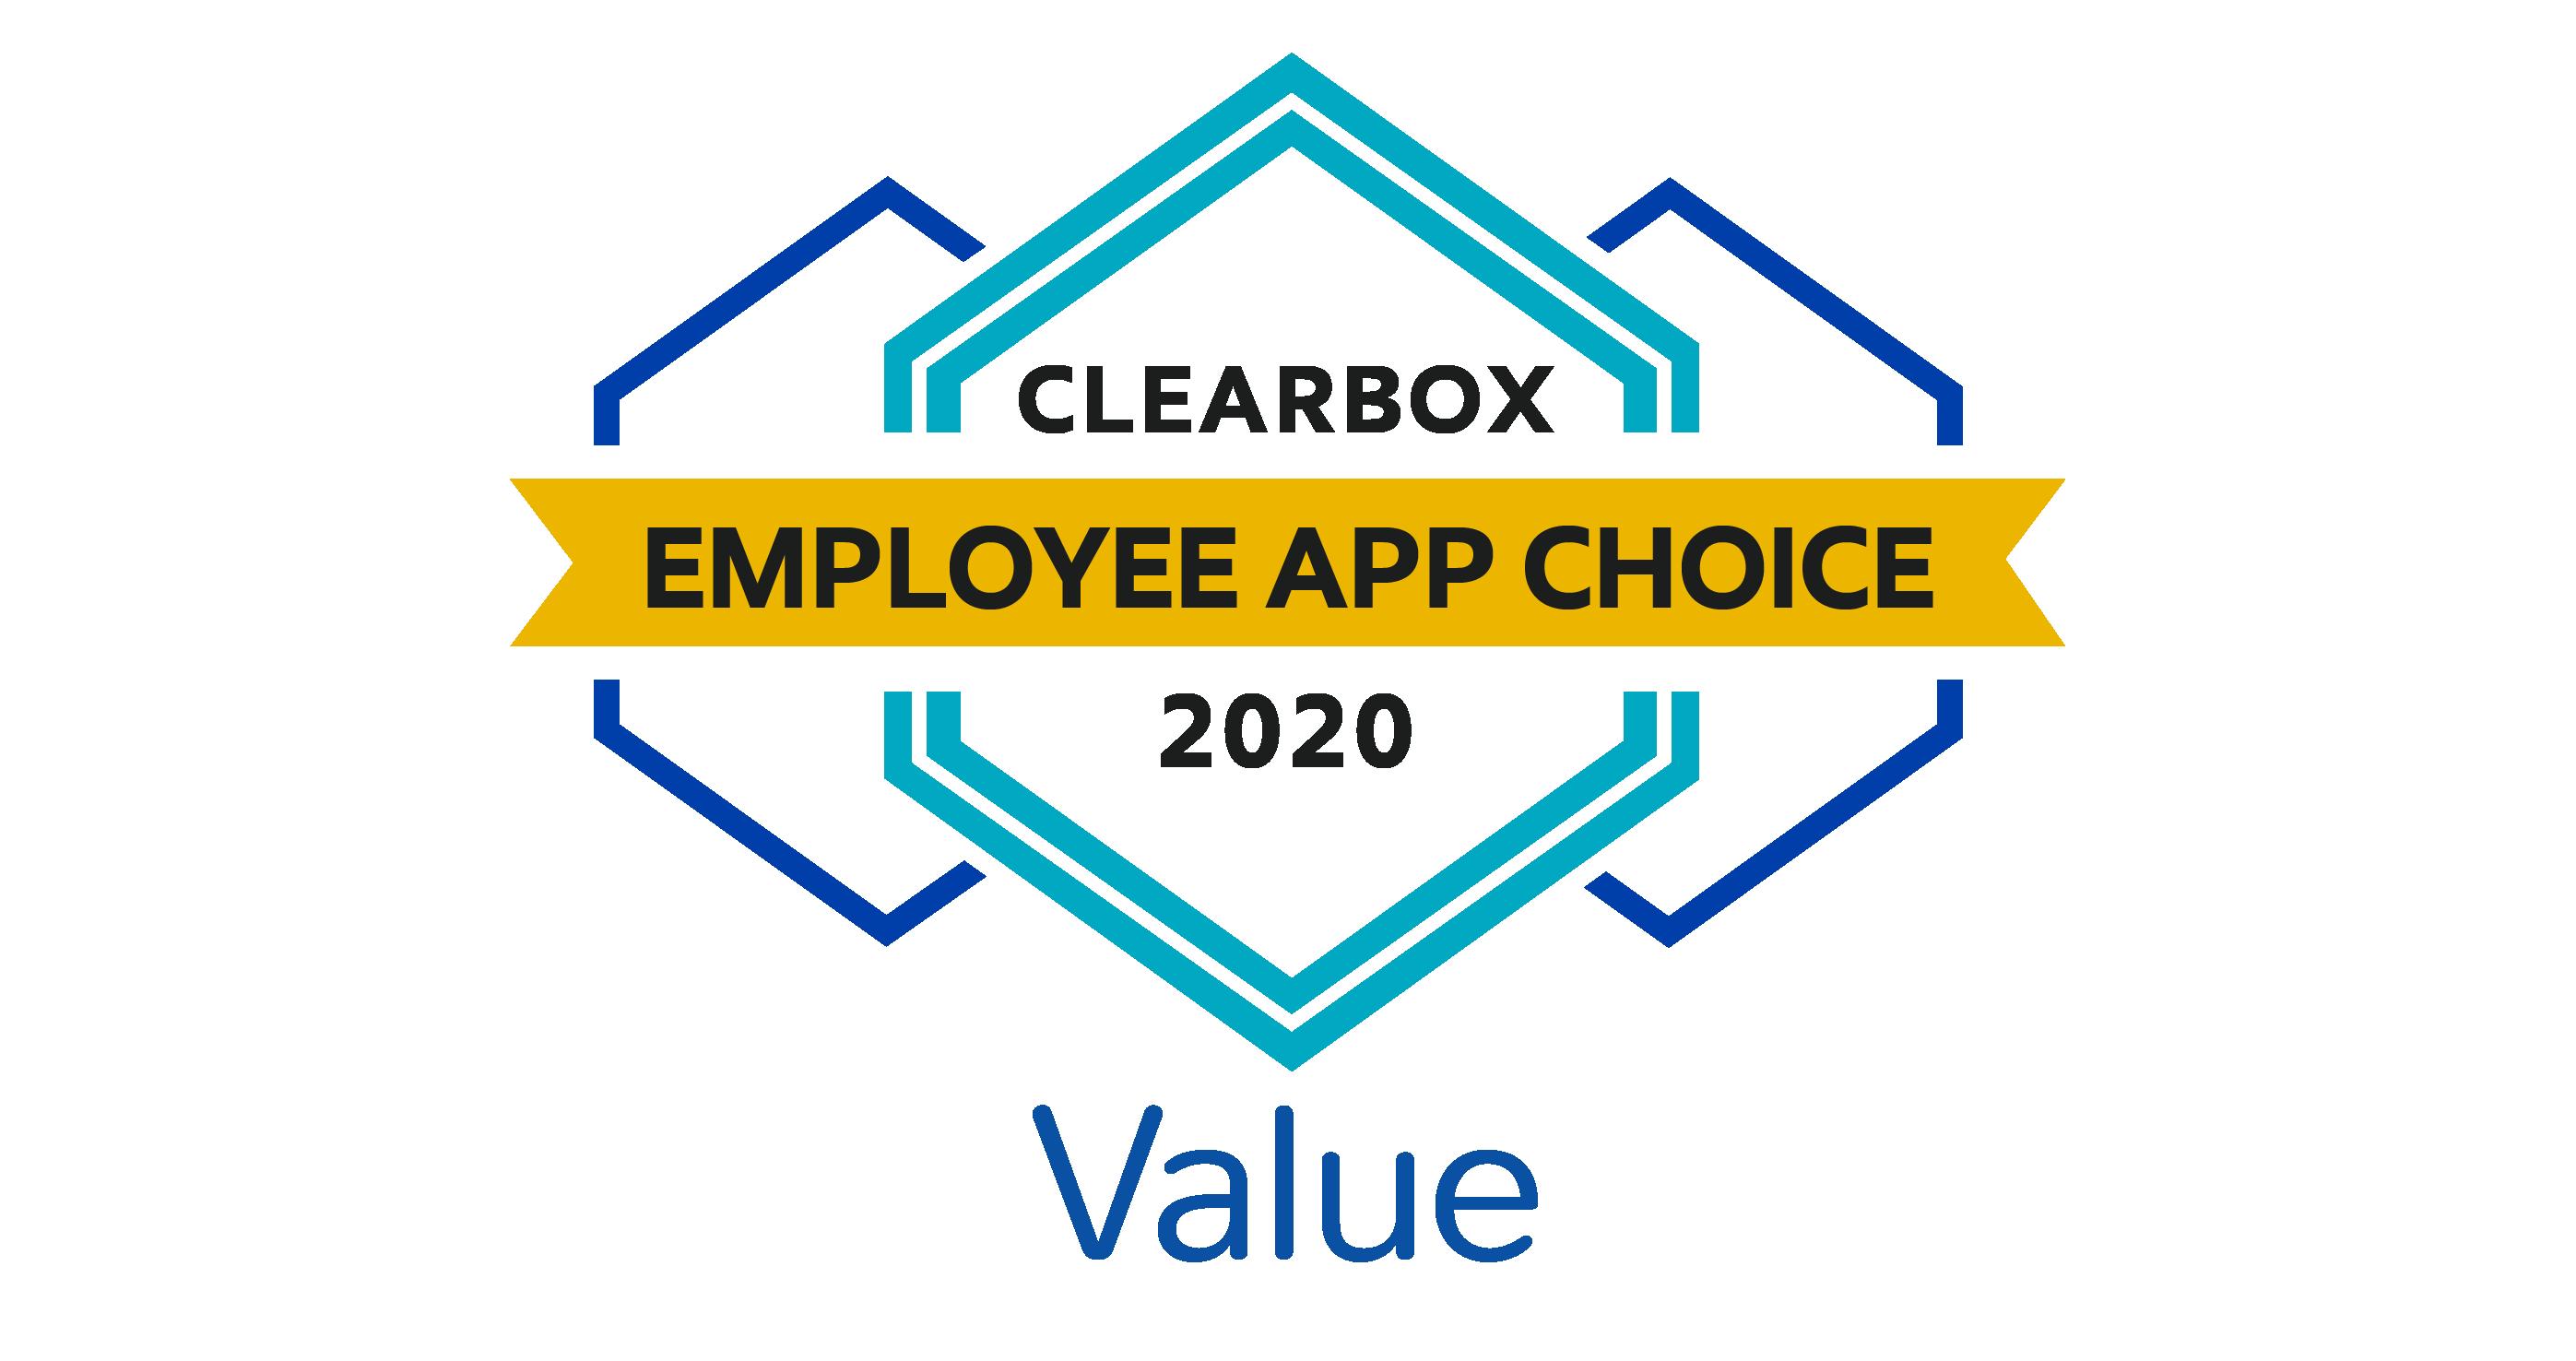 Employee app choice value 2020.